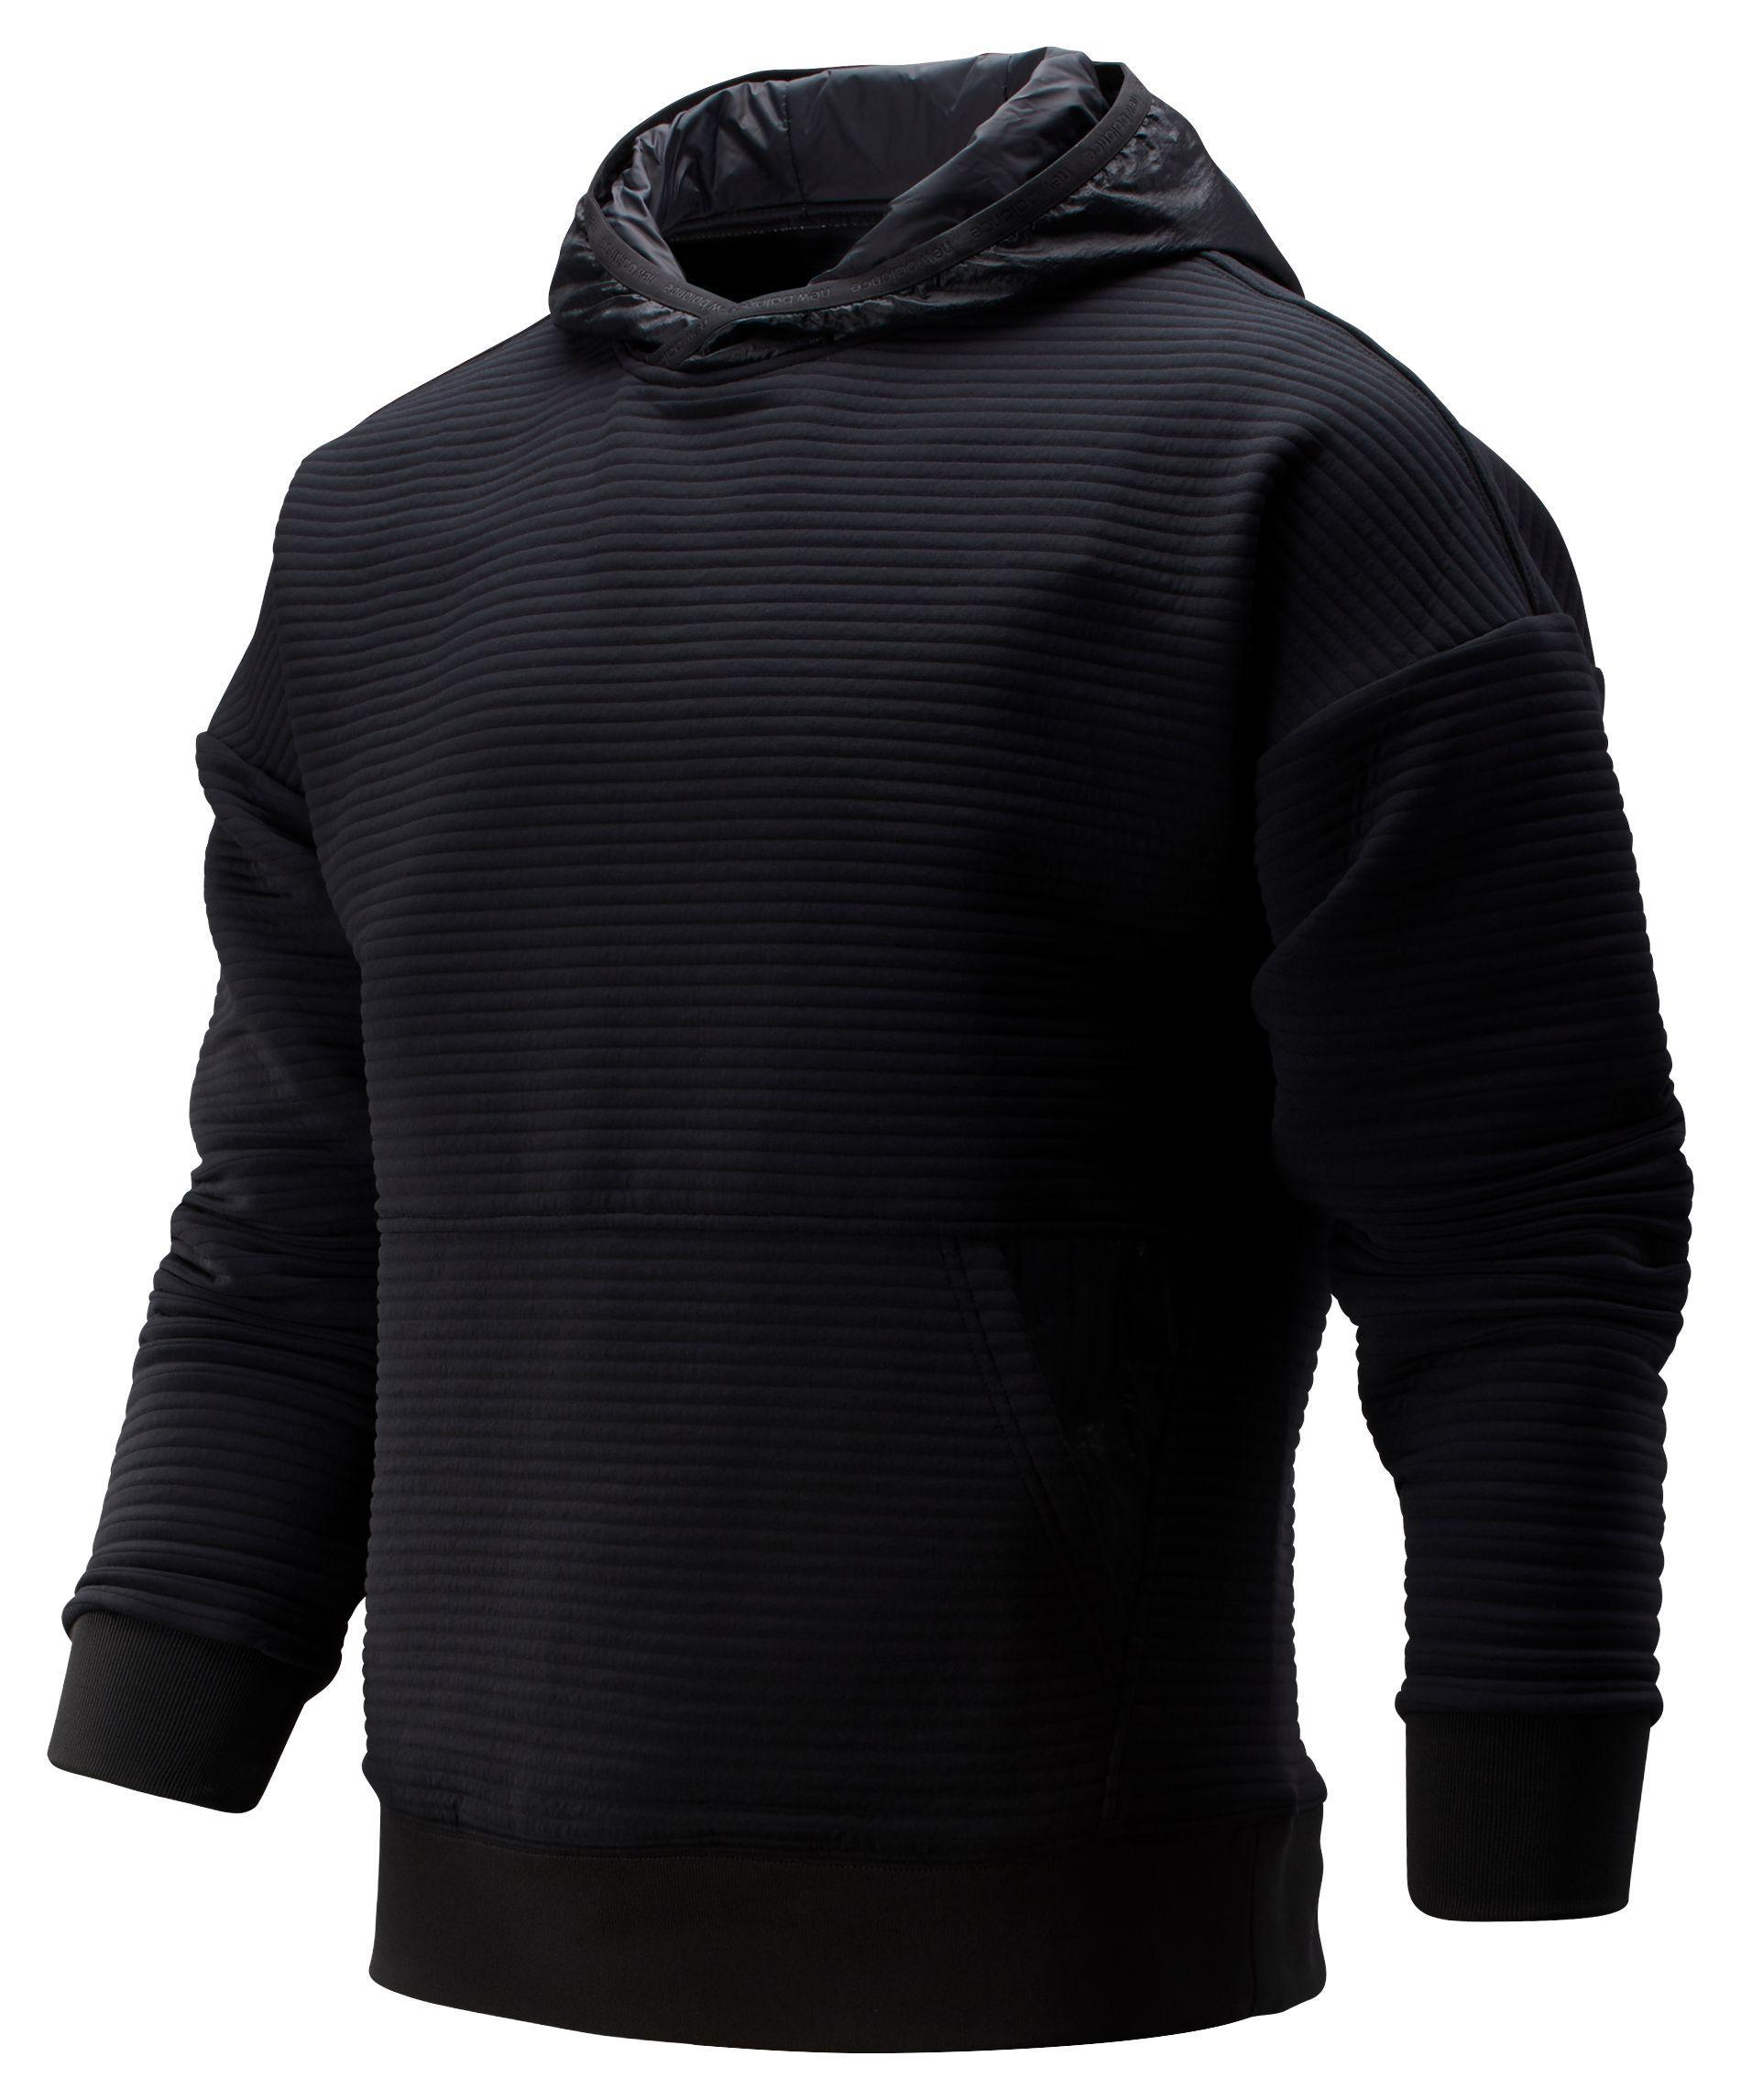 new balance sport style down sweatshirt